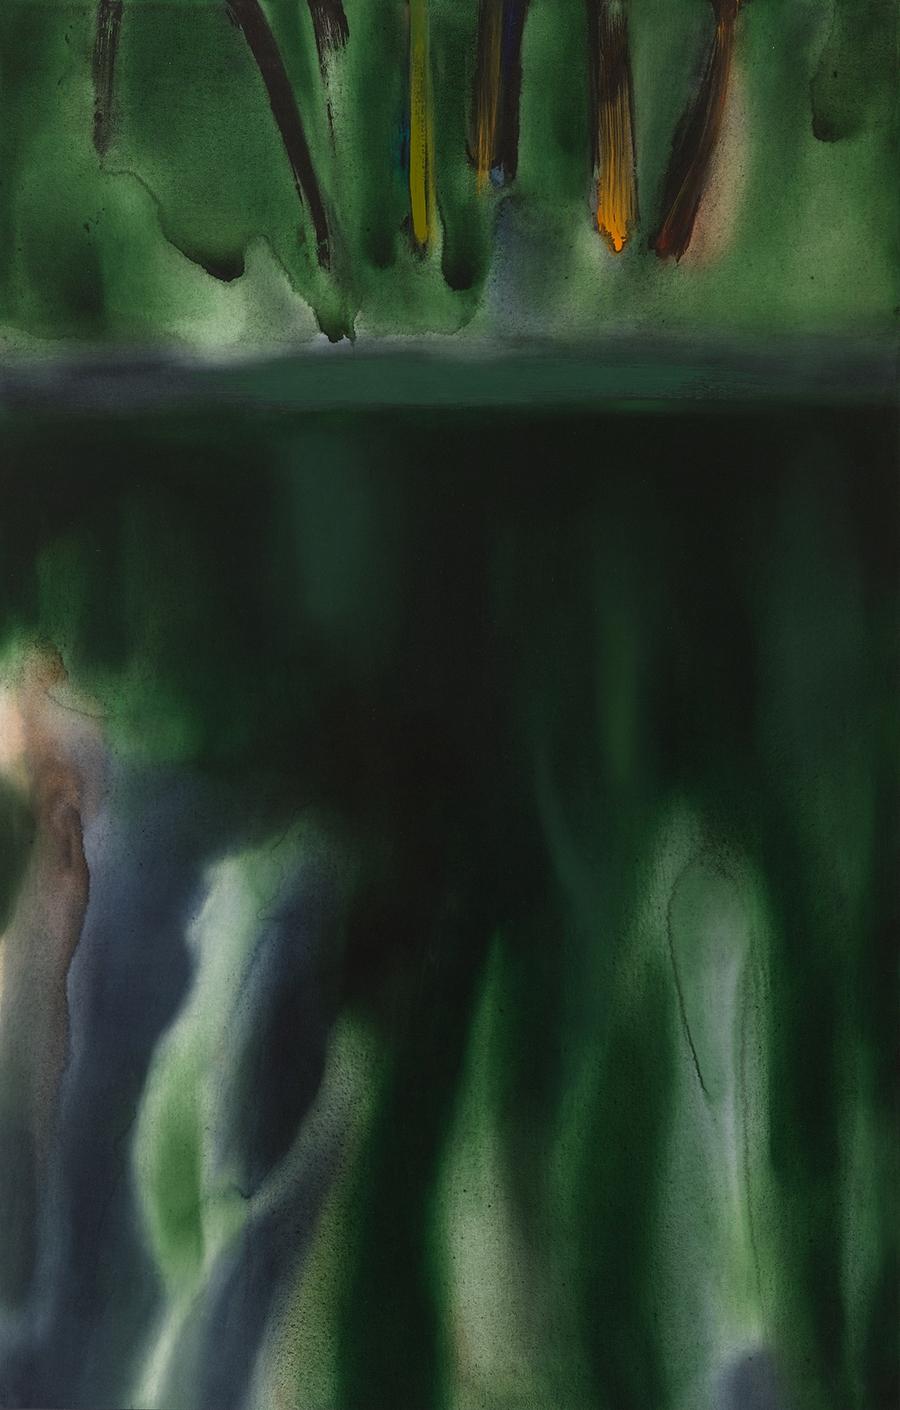 Green Reflection, II